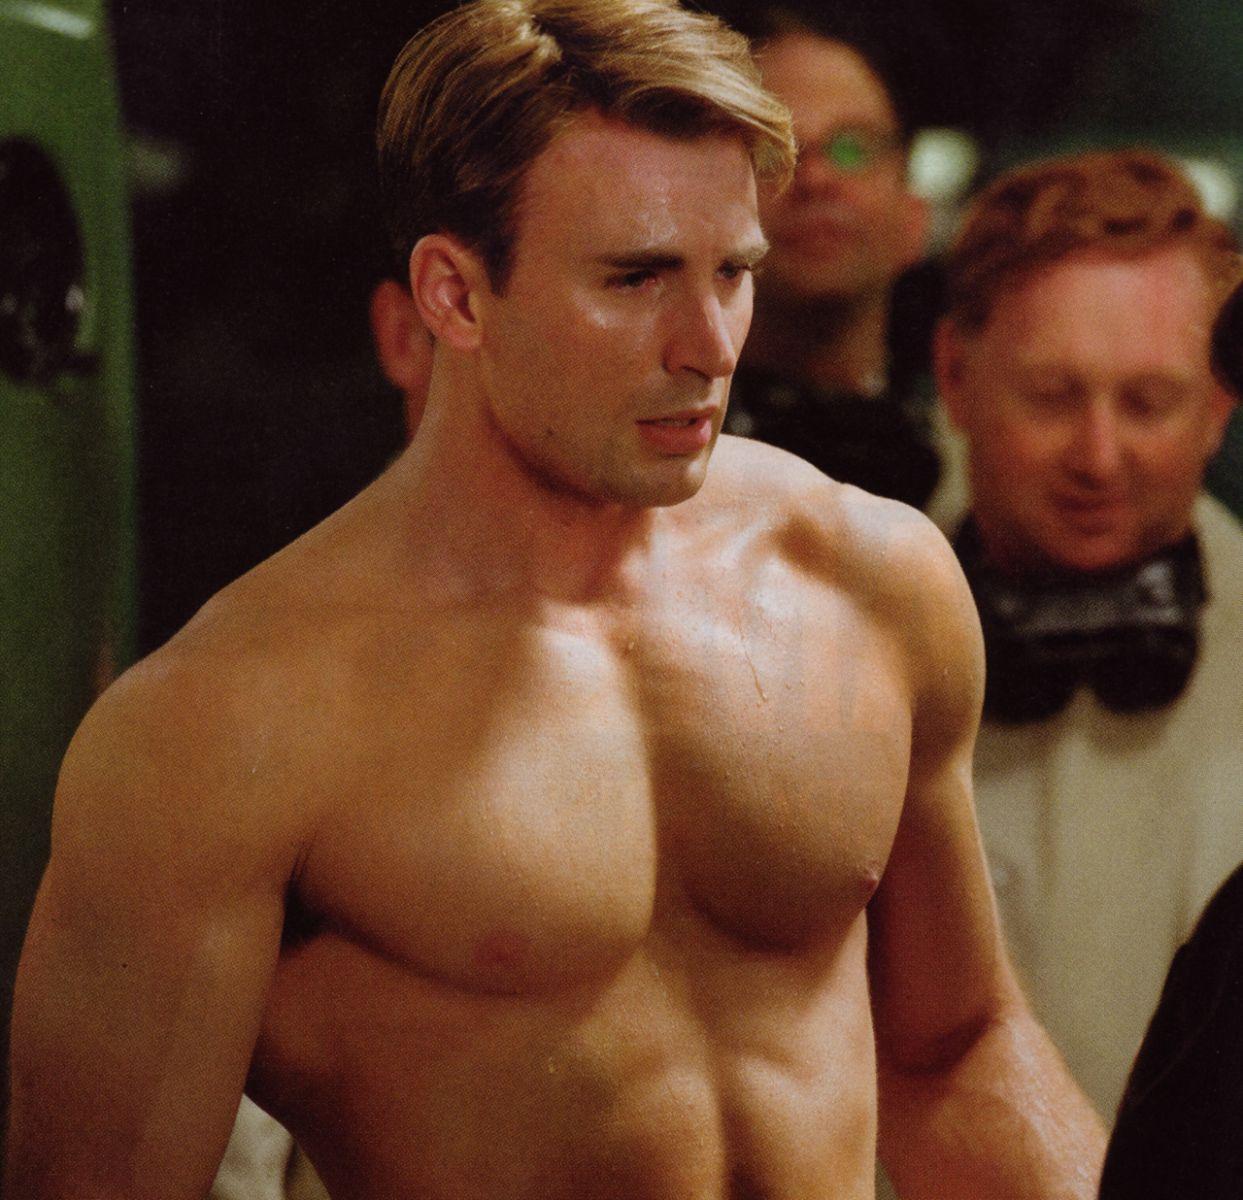 The Men Of Hollywood: Chris Evans: Hot Captain America